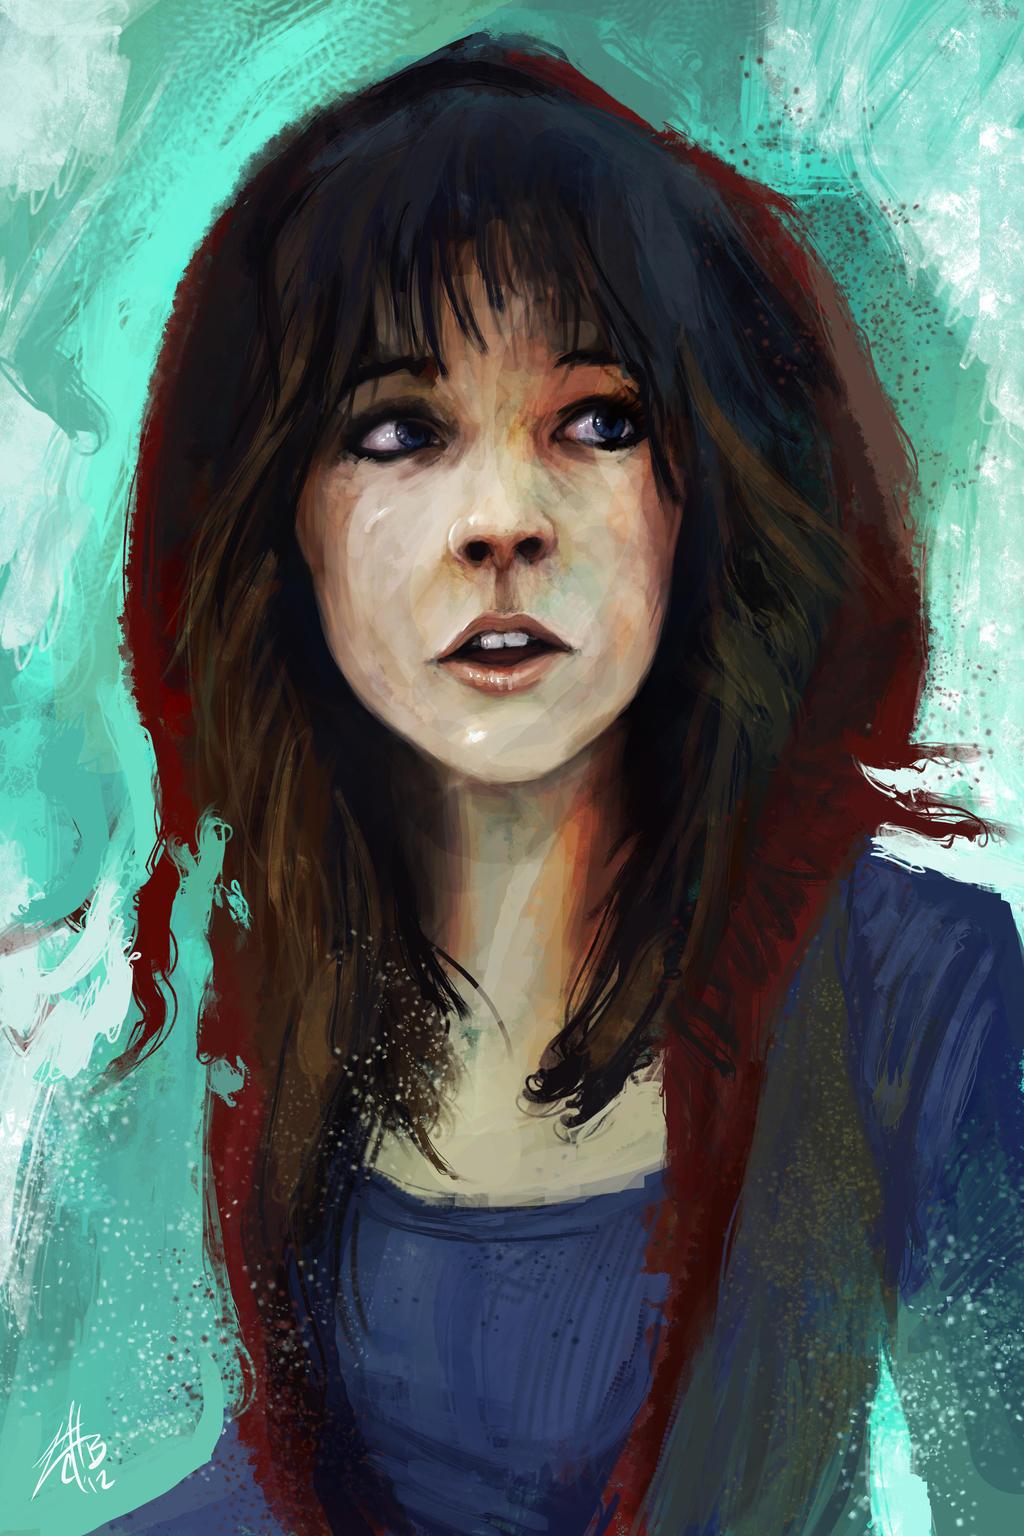 Lindsey Stirling Expression 2 by ZachDB